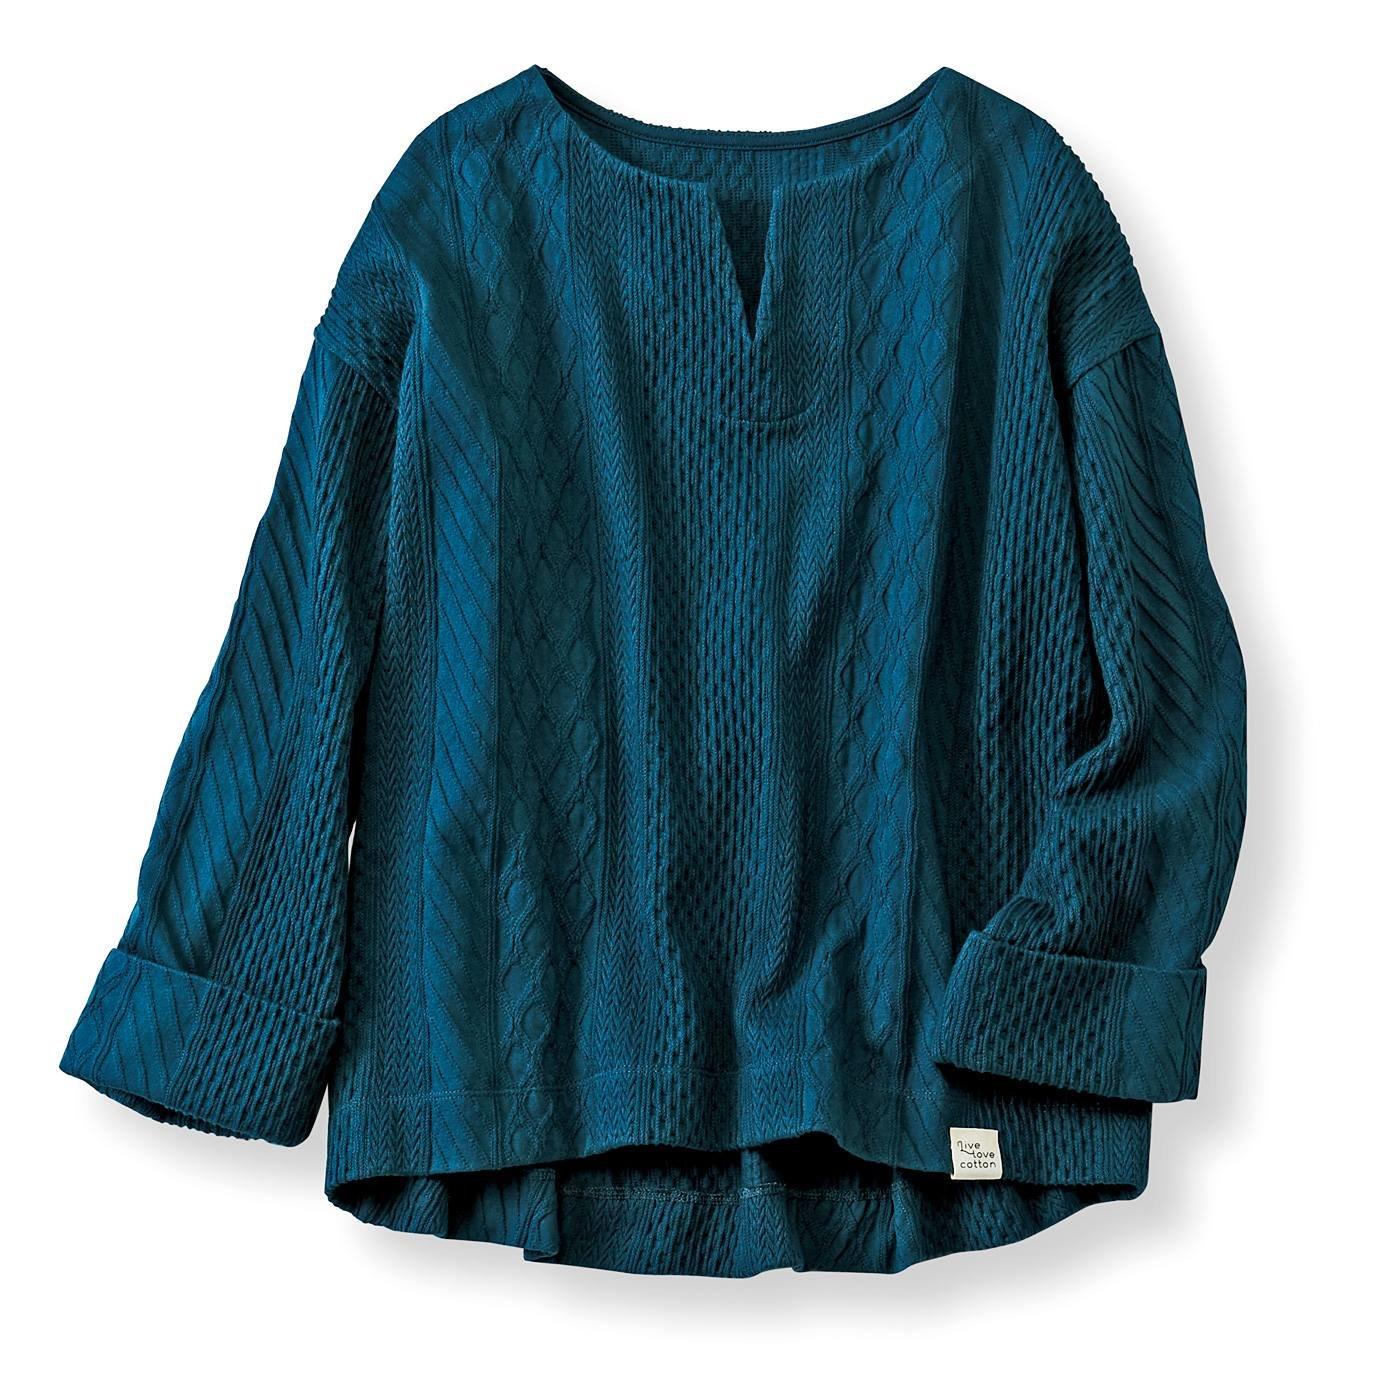 Live love cottonプロジェクト リブ イン コンフォート しっかり厚手の 柄編みが素敵なオーガニックコットントップス〈ピーコック〉